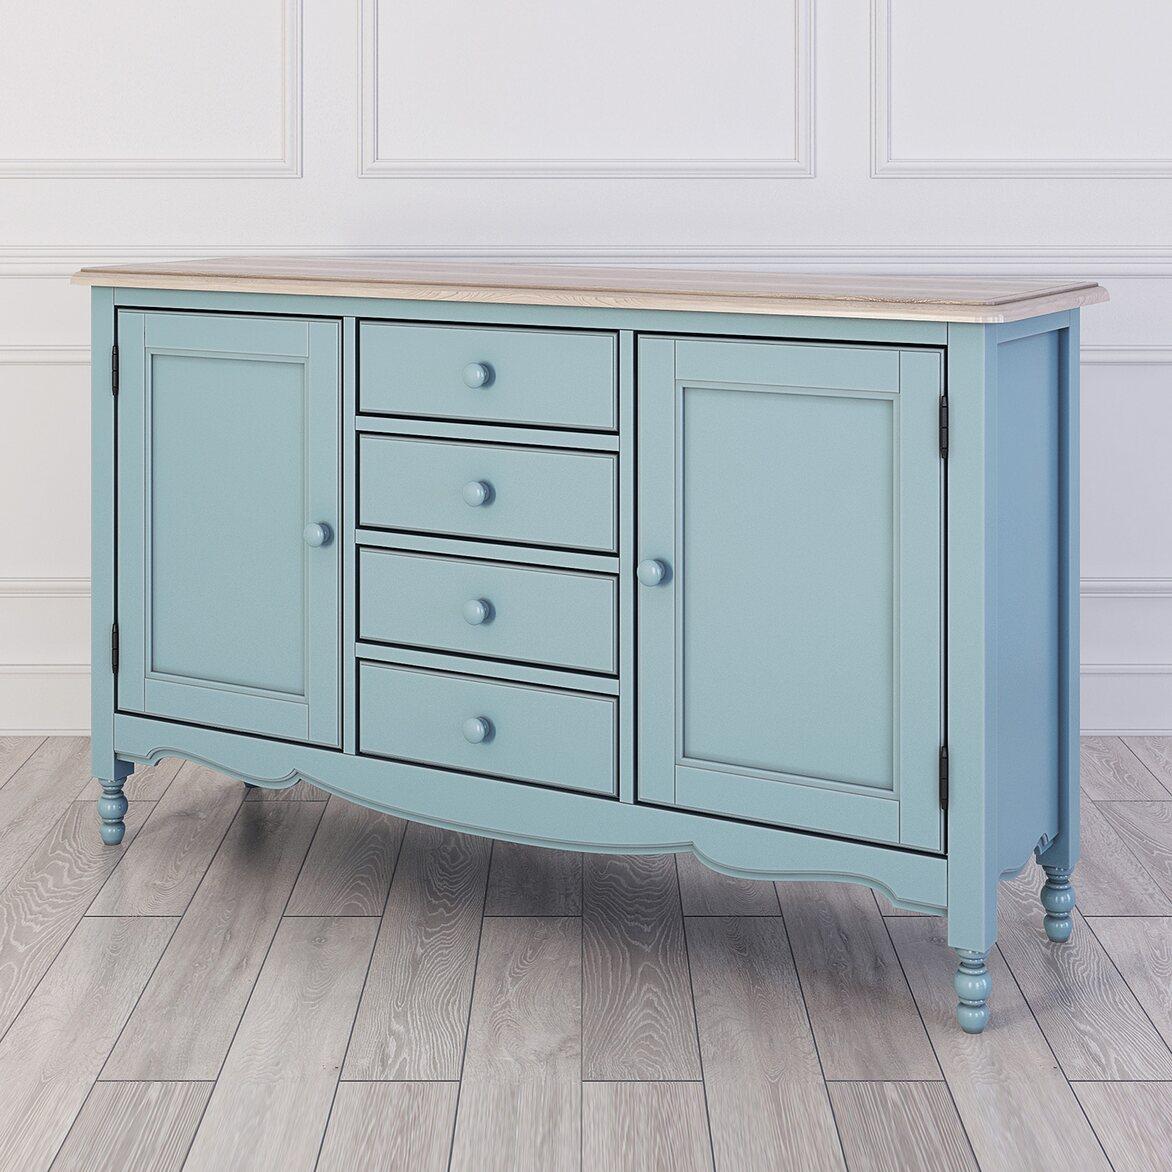 Буфет двухстворчатый с 4-я ящиками Leblanc, голубой | Буфеты Kingsby